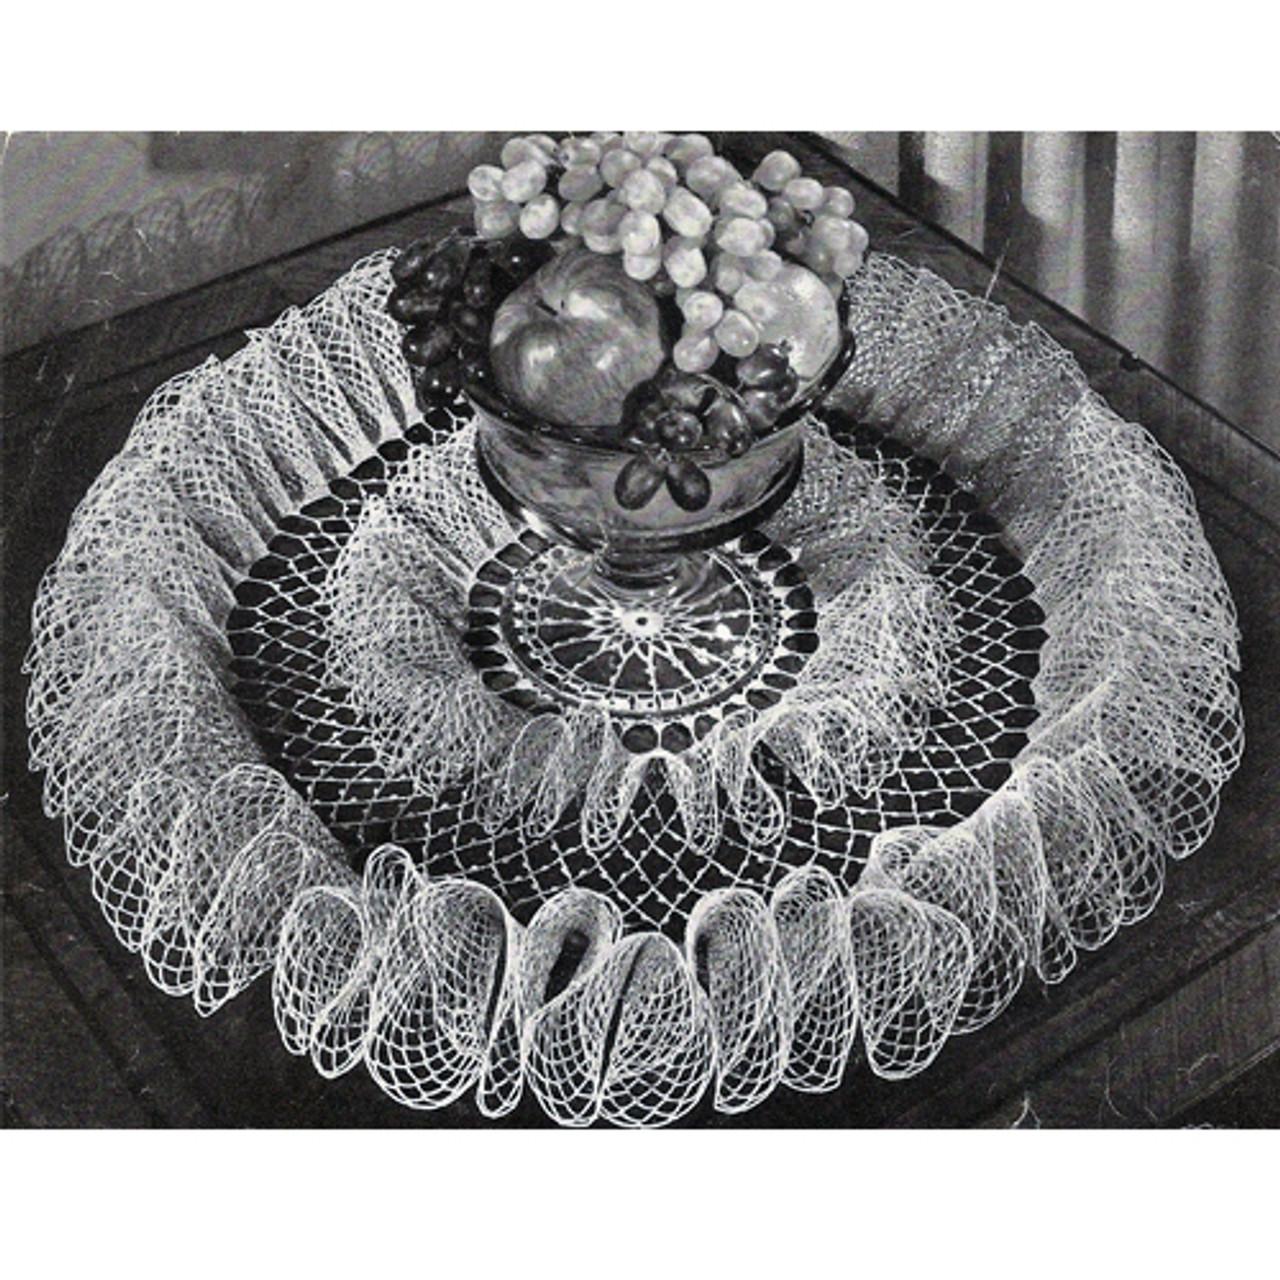 Party Frills Double Ruffle Crochet Doily Pattern